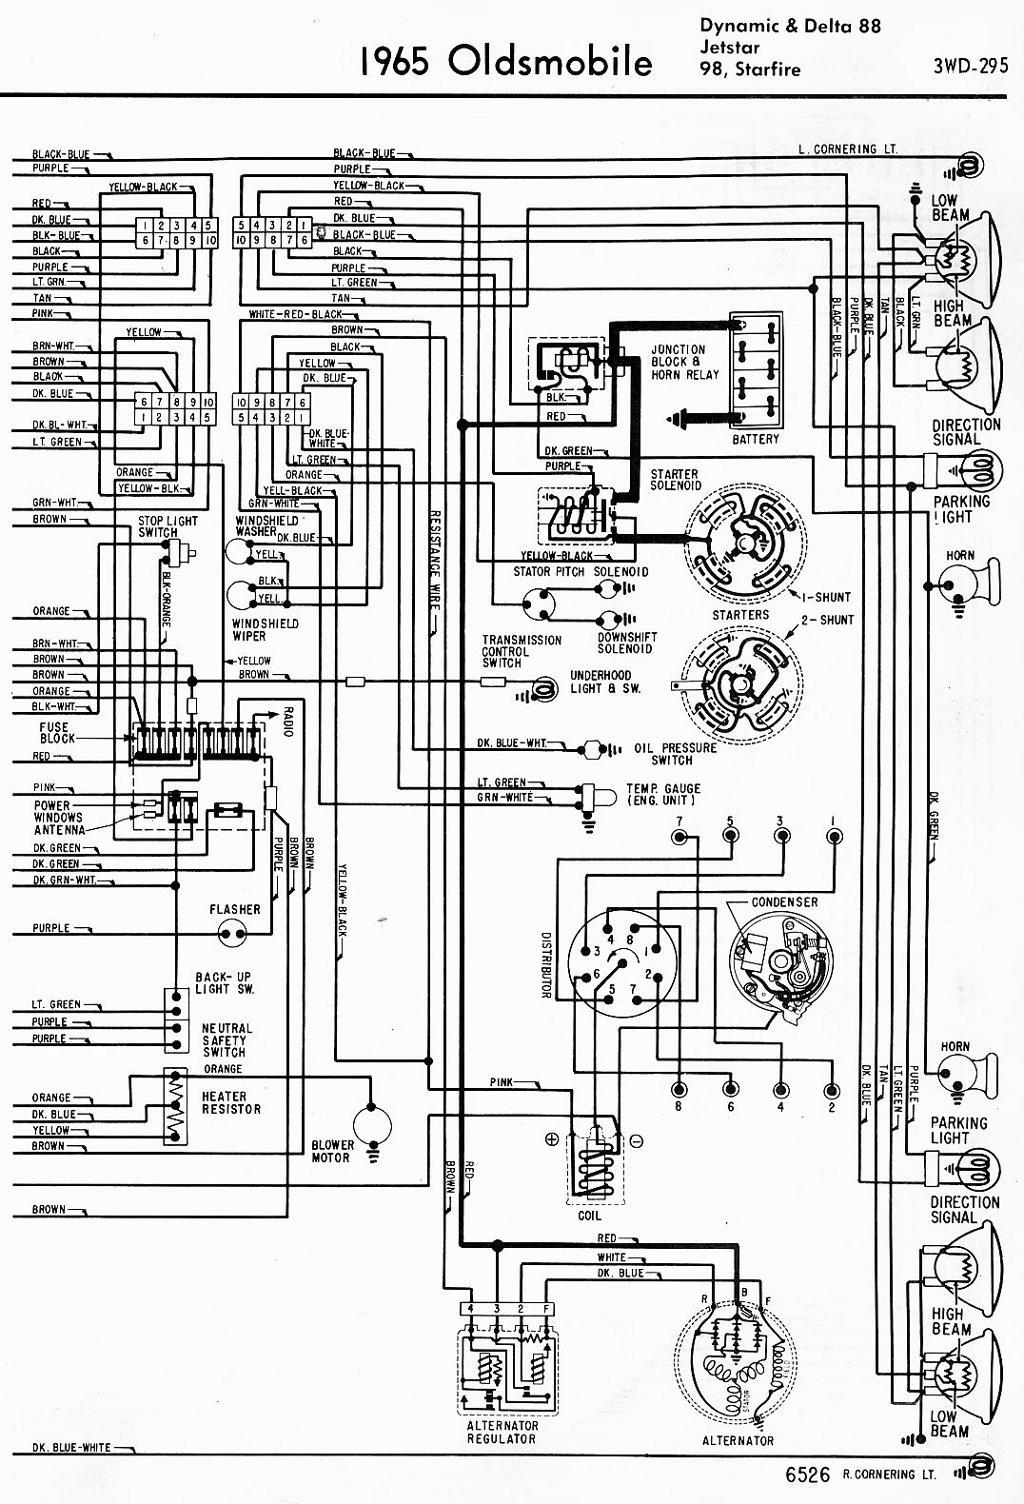 1998 oldsmobile 88 wiring diagram 1998 oldsmobile intrigue radio olds aurora hvac wiring diagram wiring database library rh 11 arteciock de 1999 oldsmobile 88 wiring diagram 1997 oldsmobile 88 wiring diagram